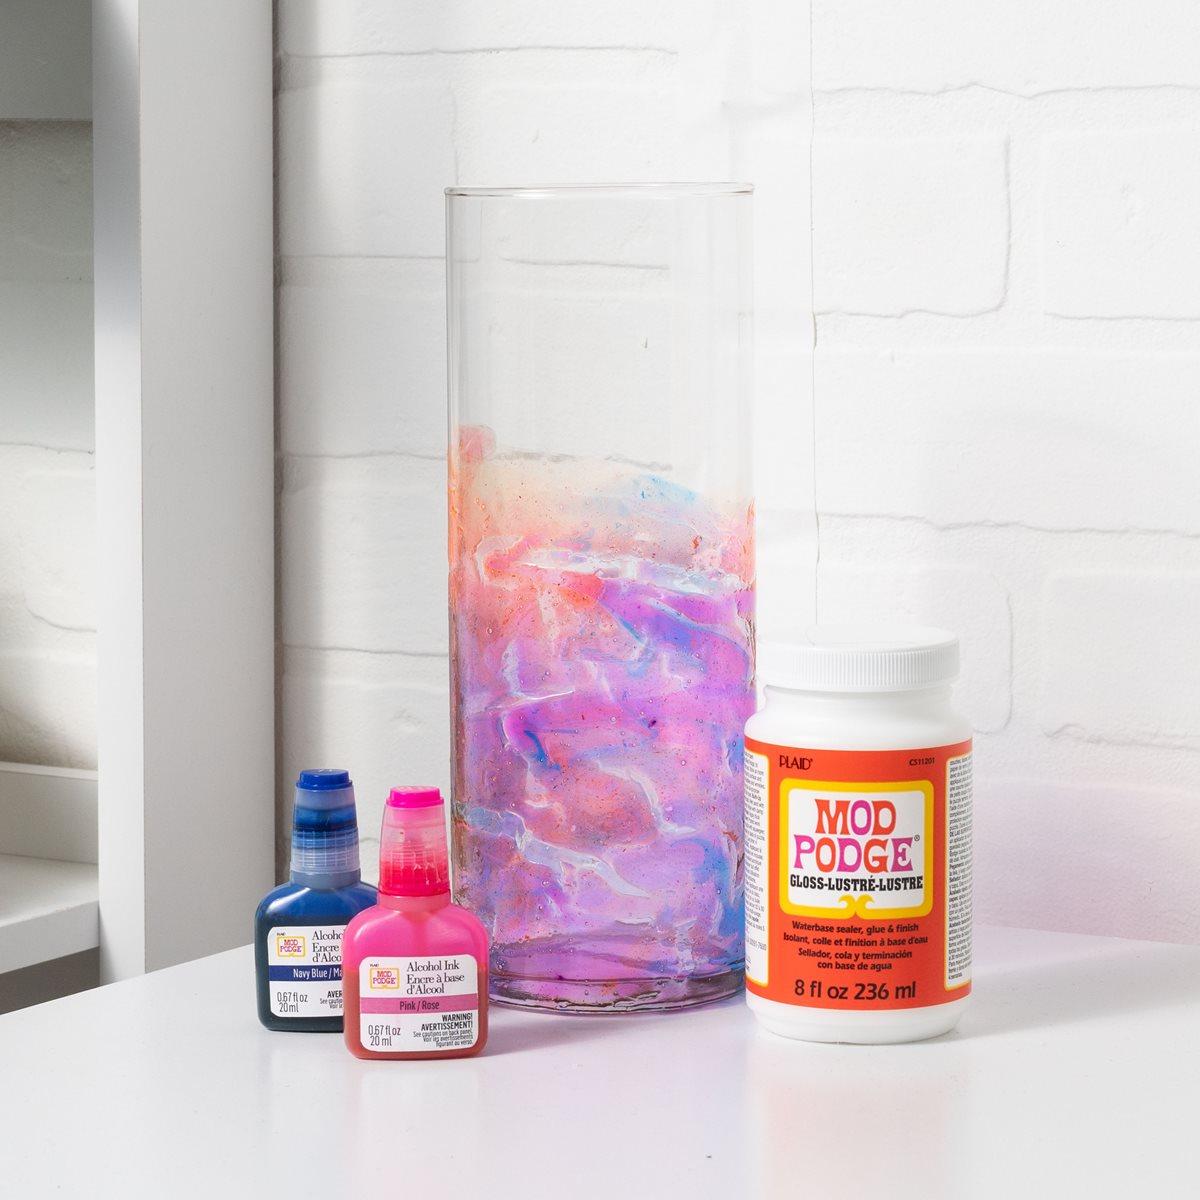 Alcohol Inks and Mod Podge Vase